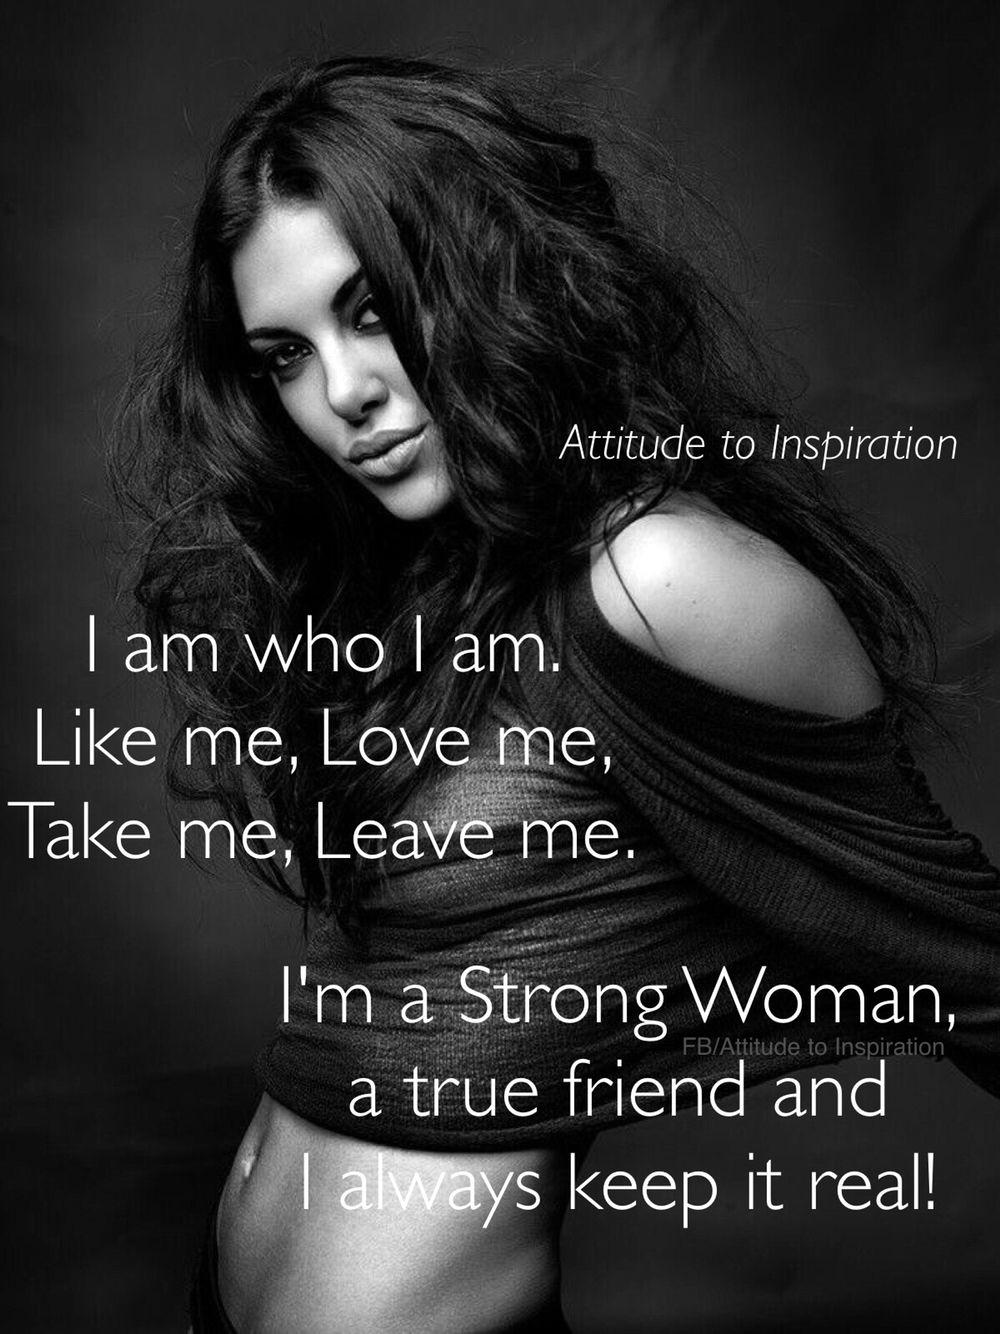 FB/Attitude to Inspiration.. Strong Woman Pinterest